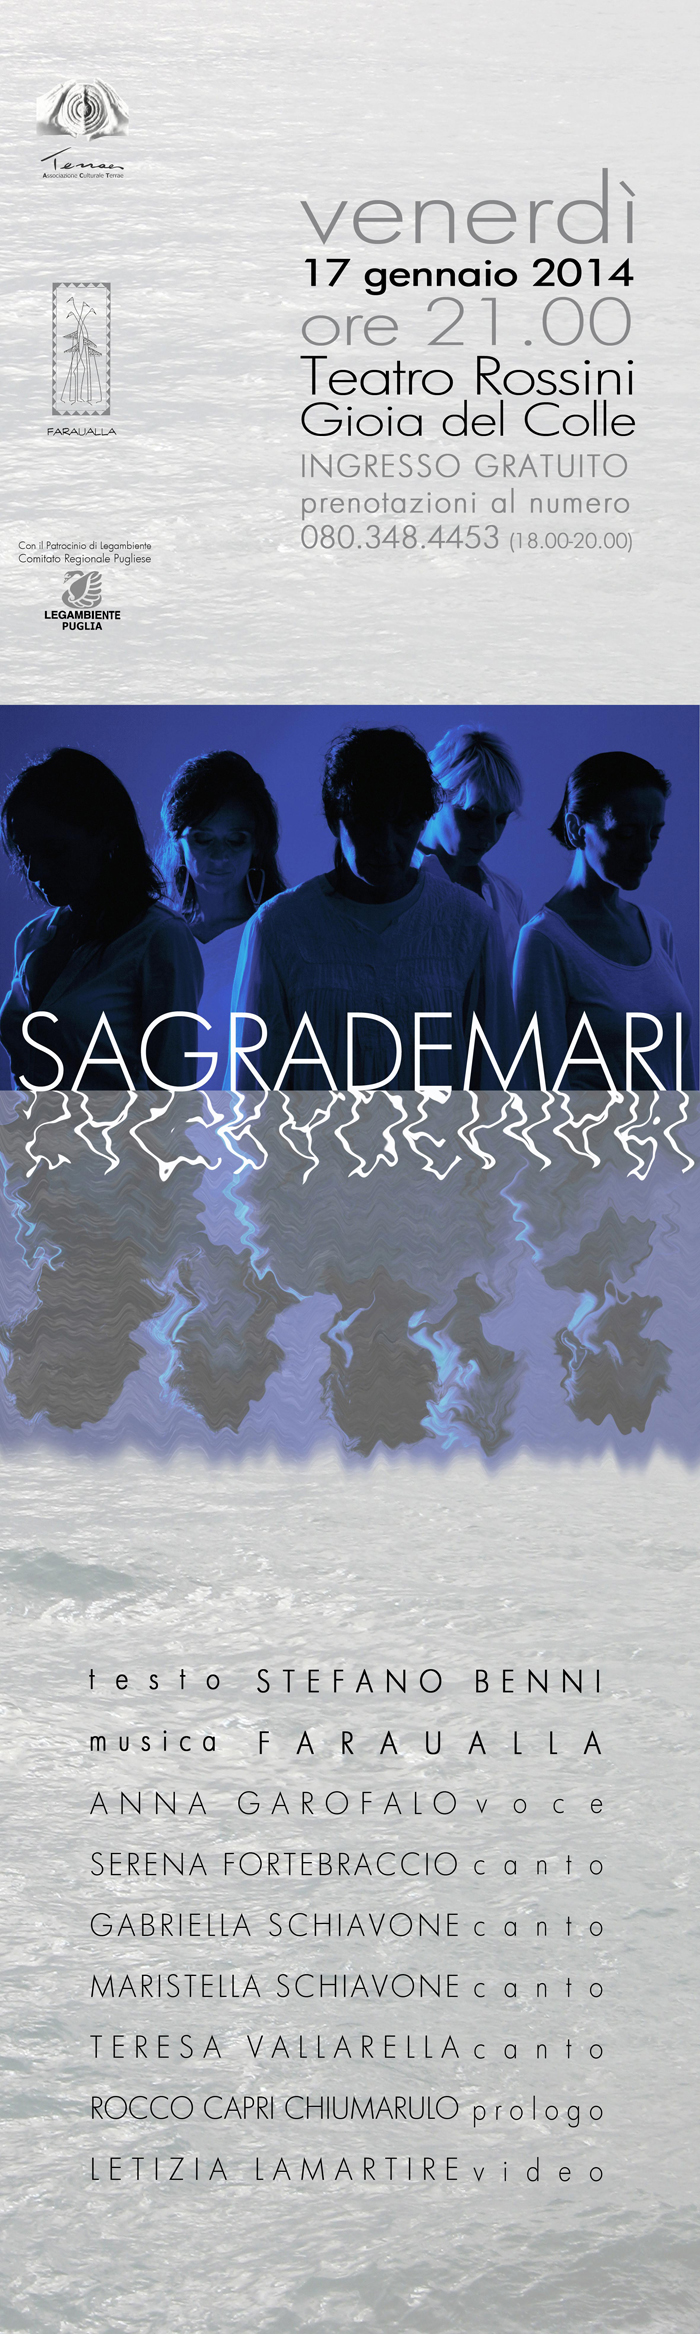 SAGRADEMARI_-loc-ok-x-Gioia